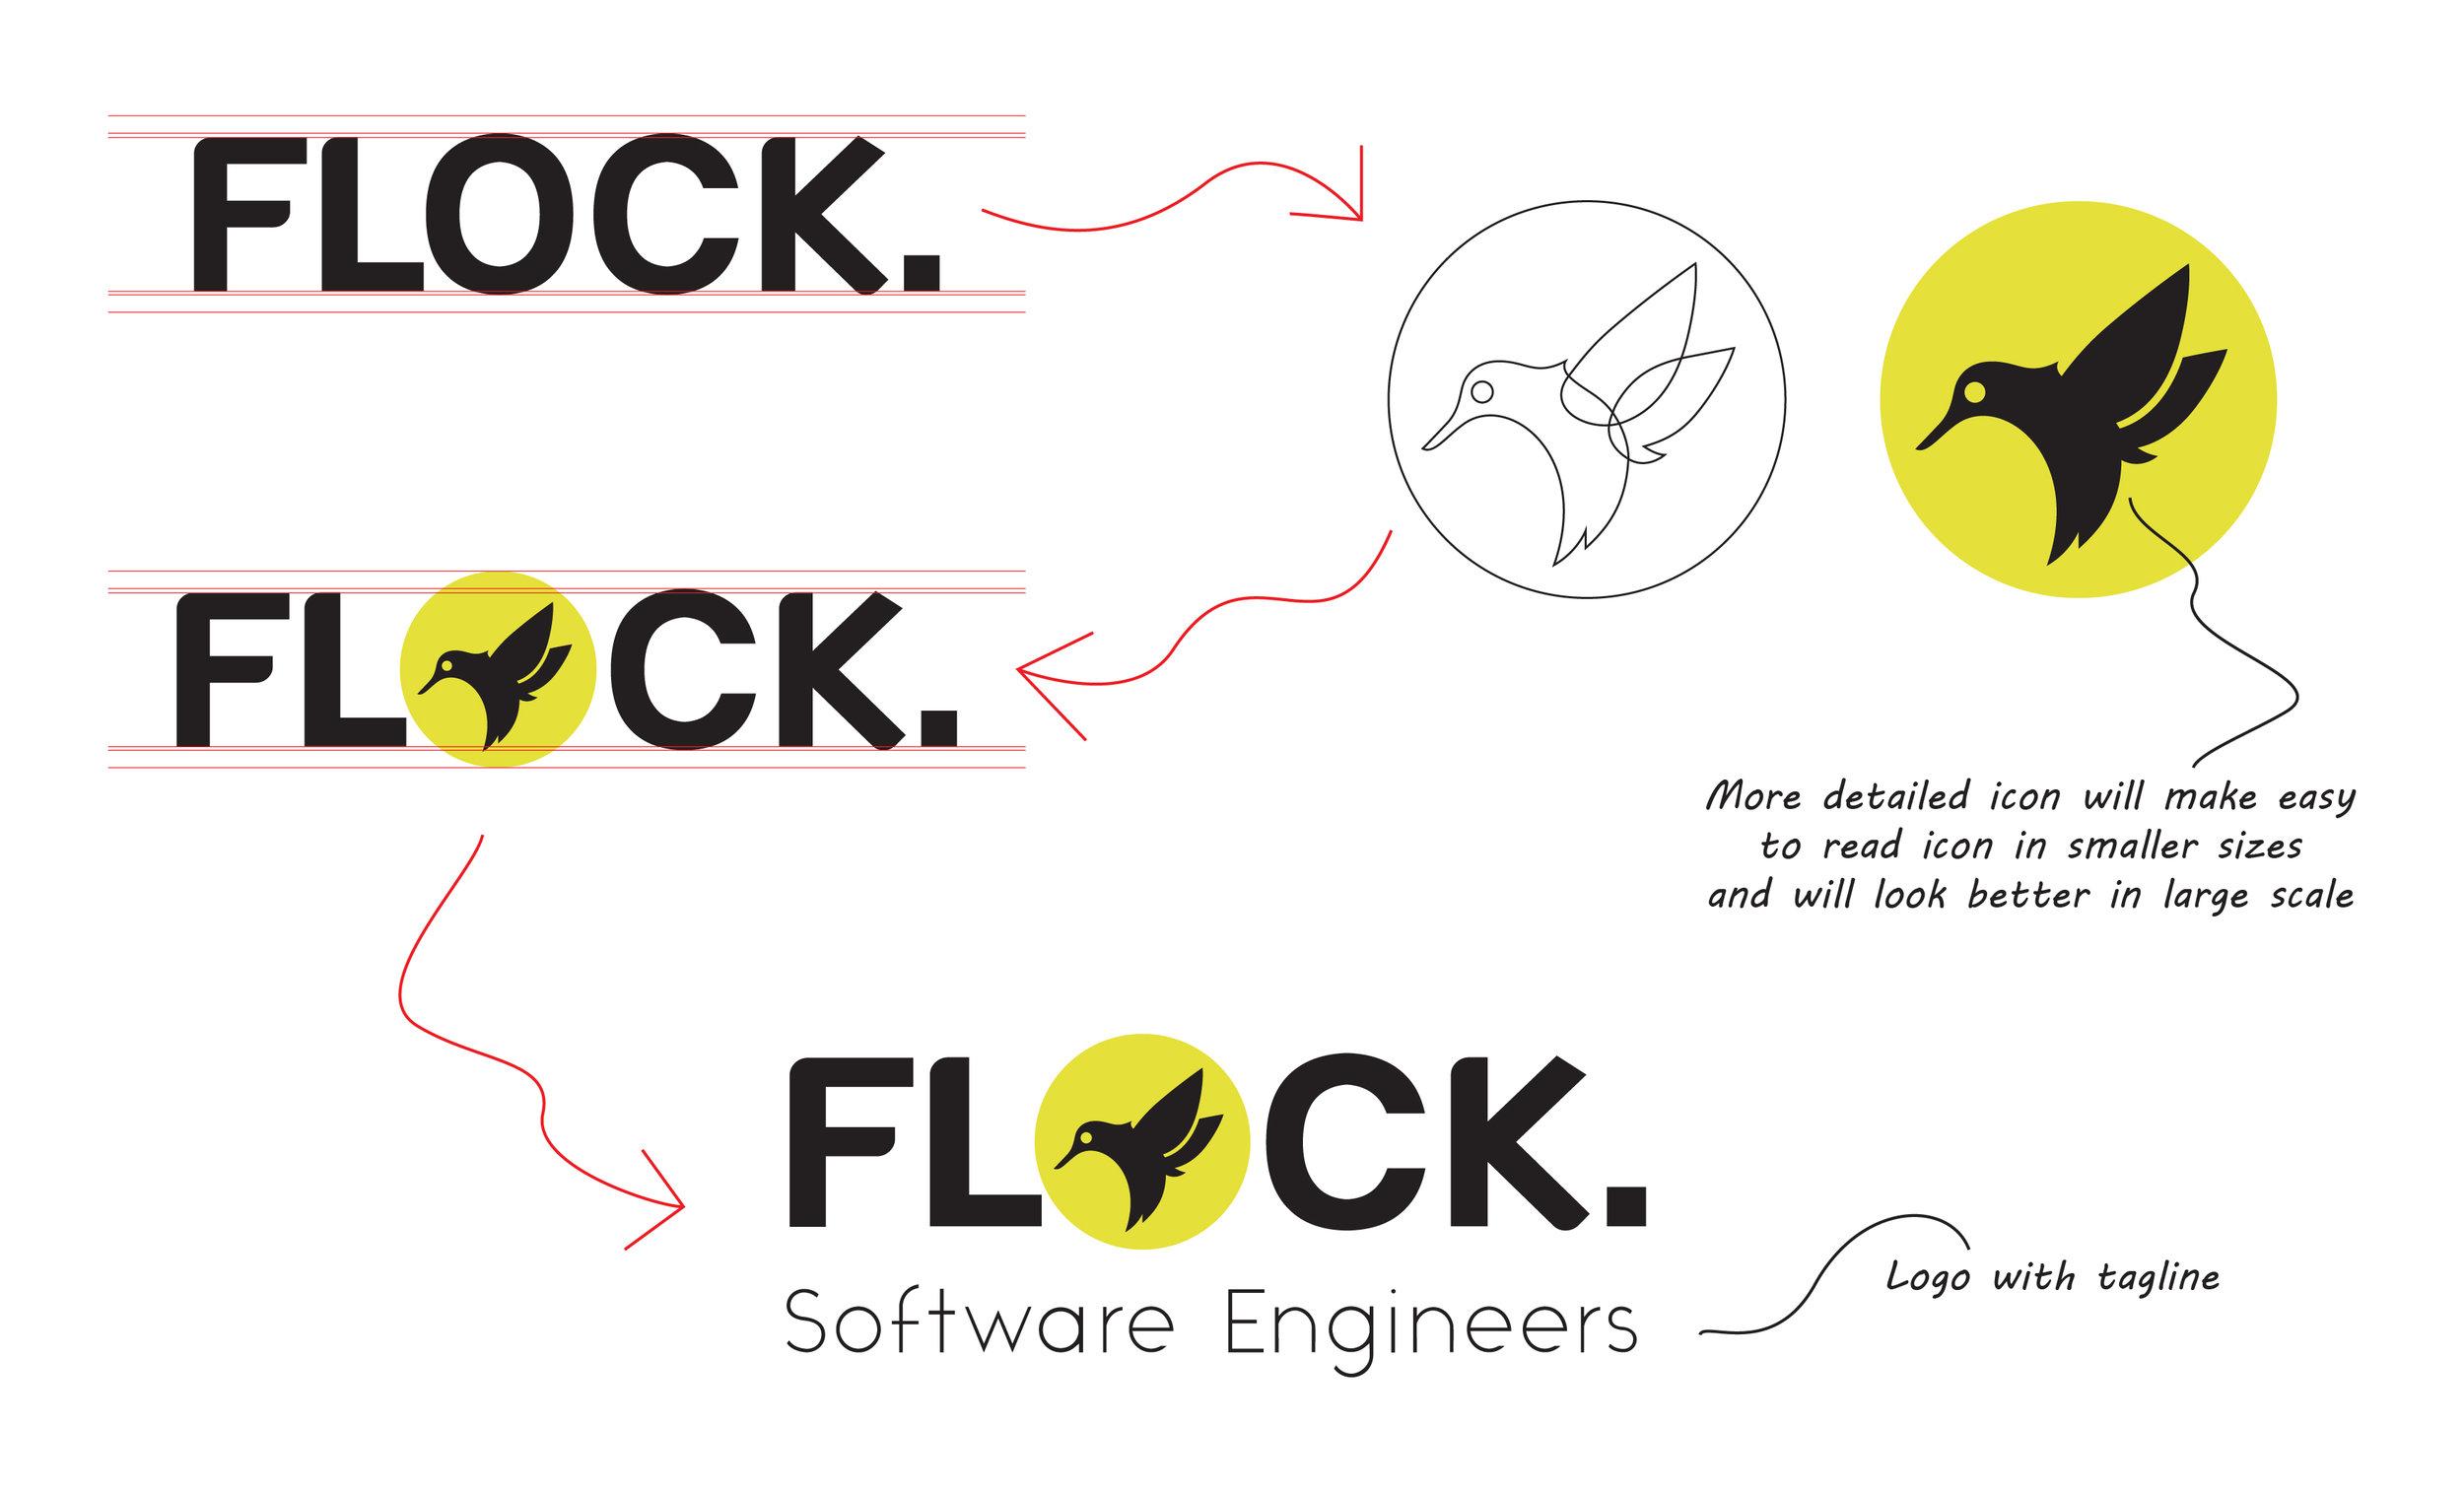 Flock_logo_final-02.jpg